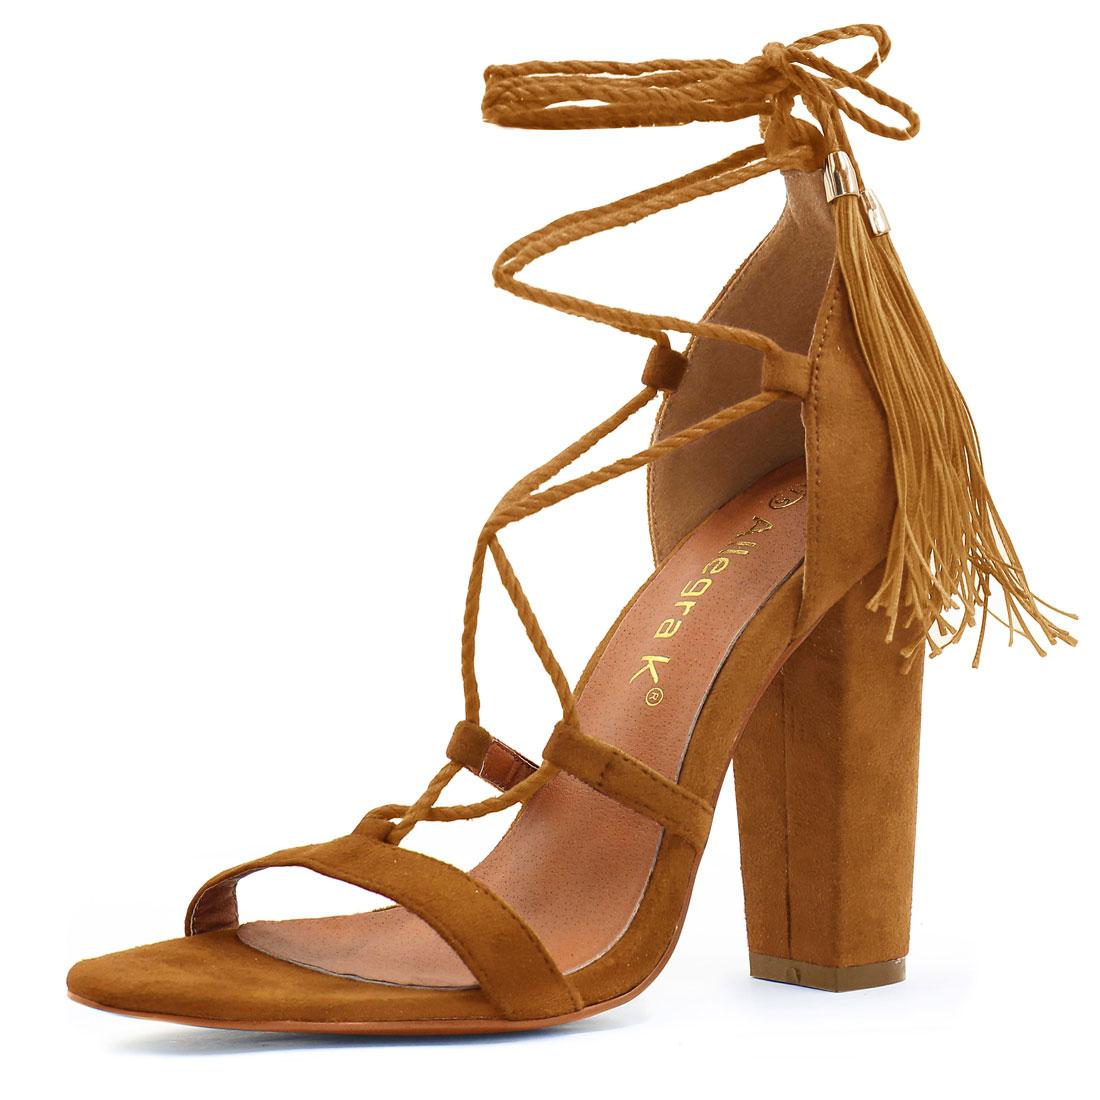 Women Chunky High Heel Tassel Closure Lace Up Sandals Camel US 6.5